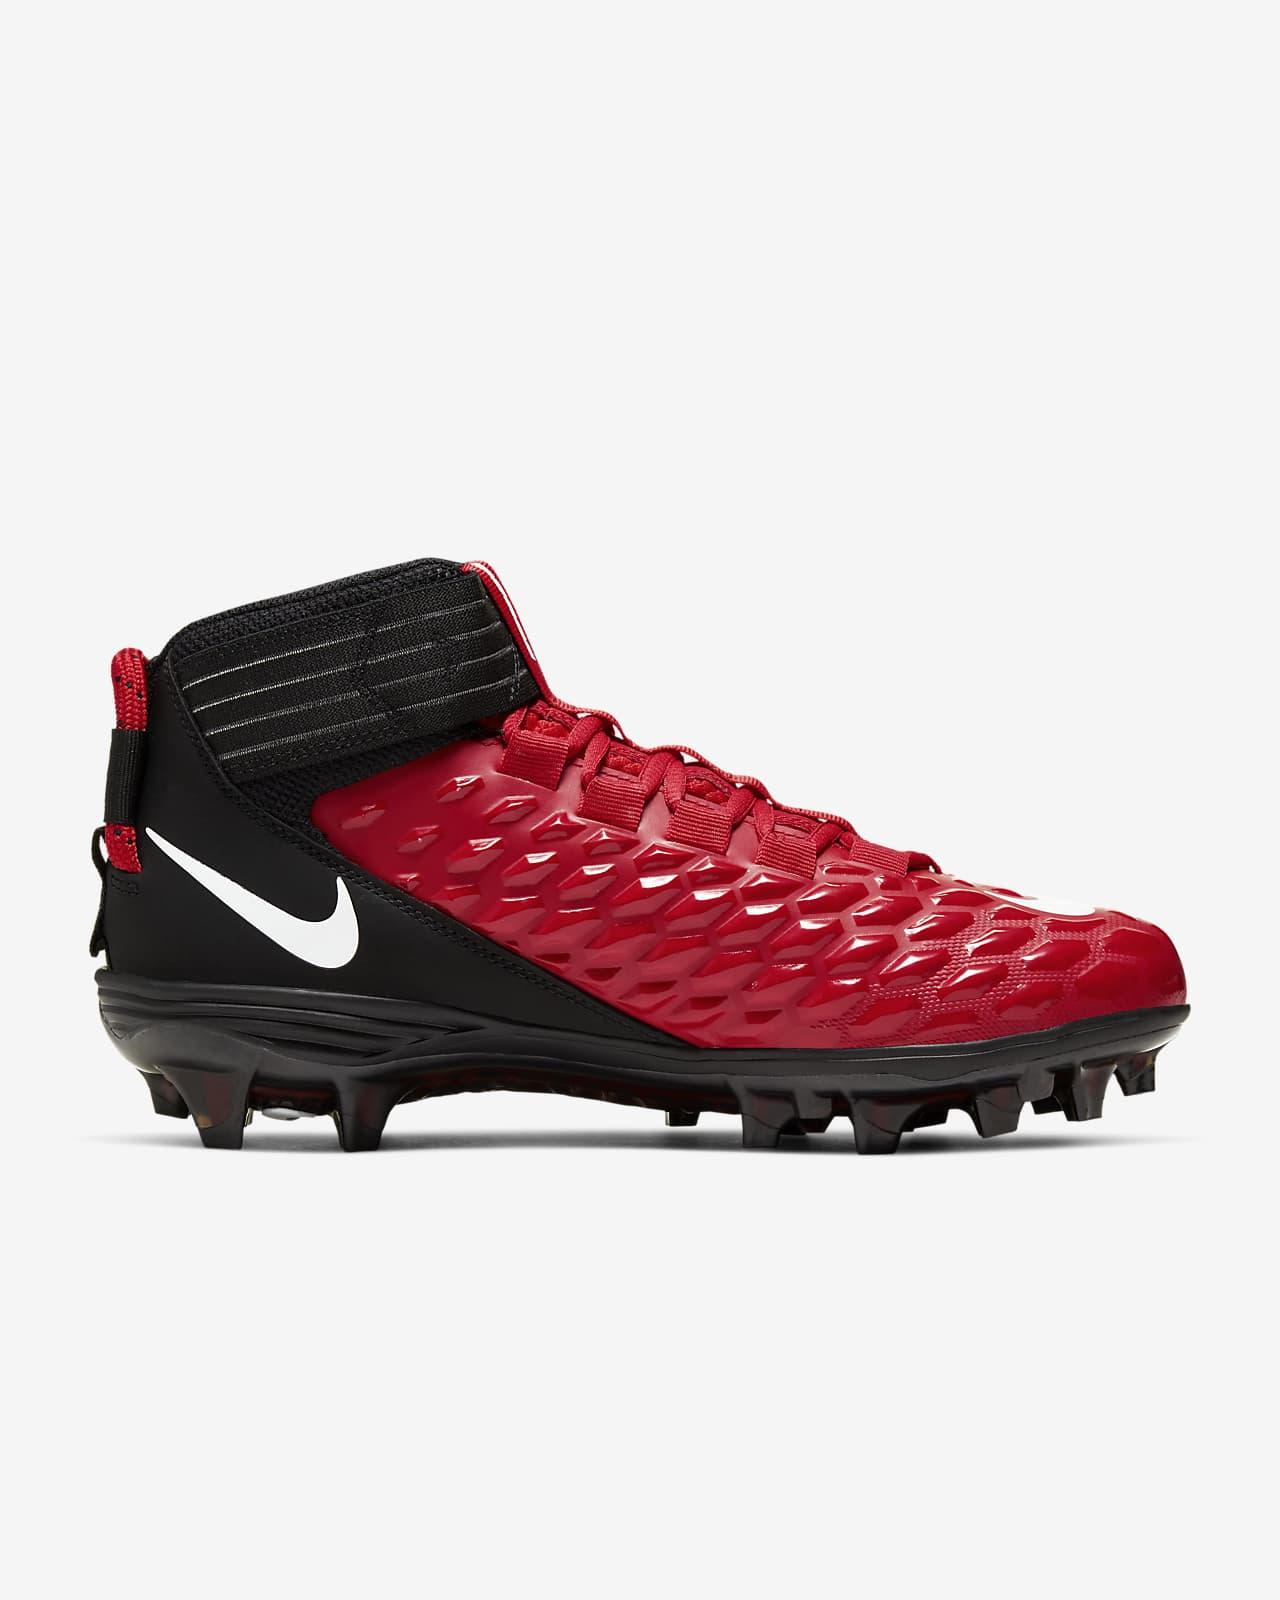 Nike Force Savage Pro 2 Men's Football